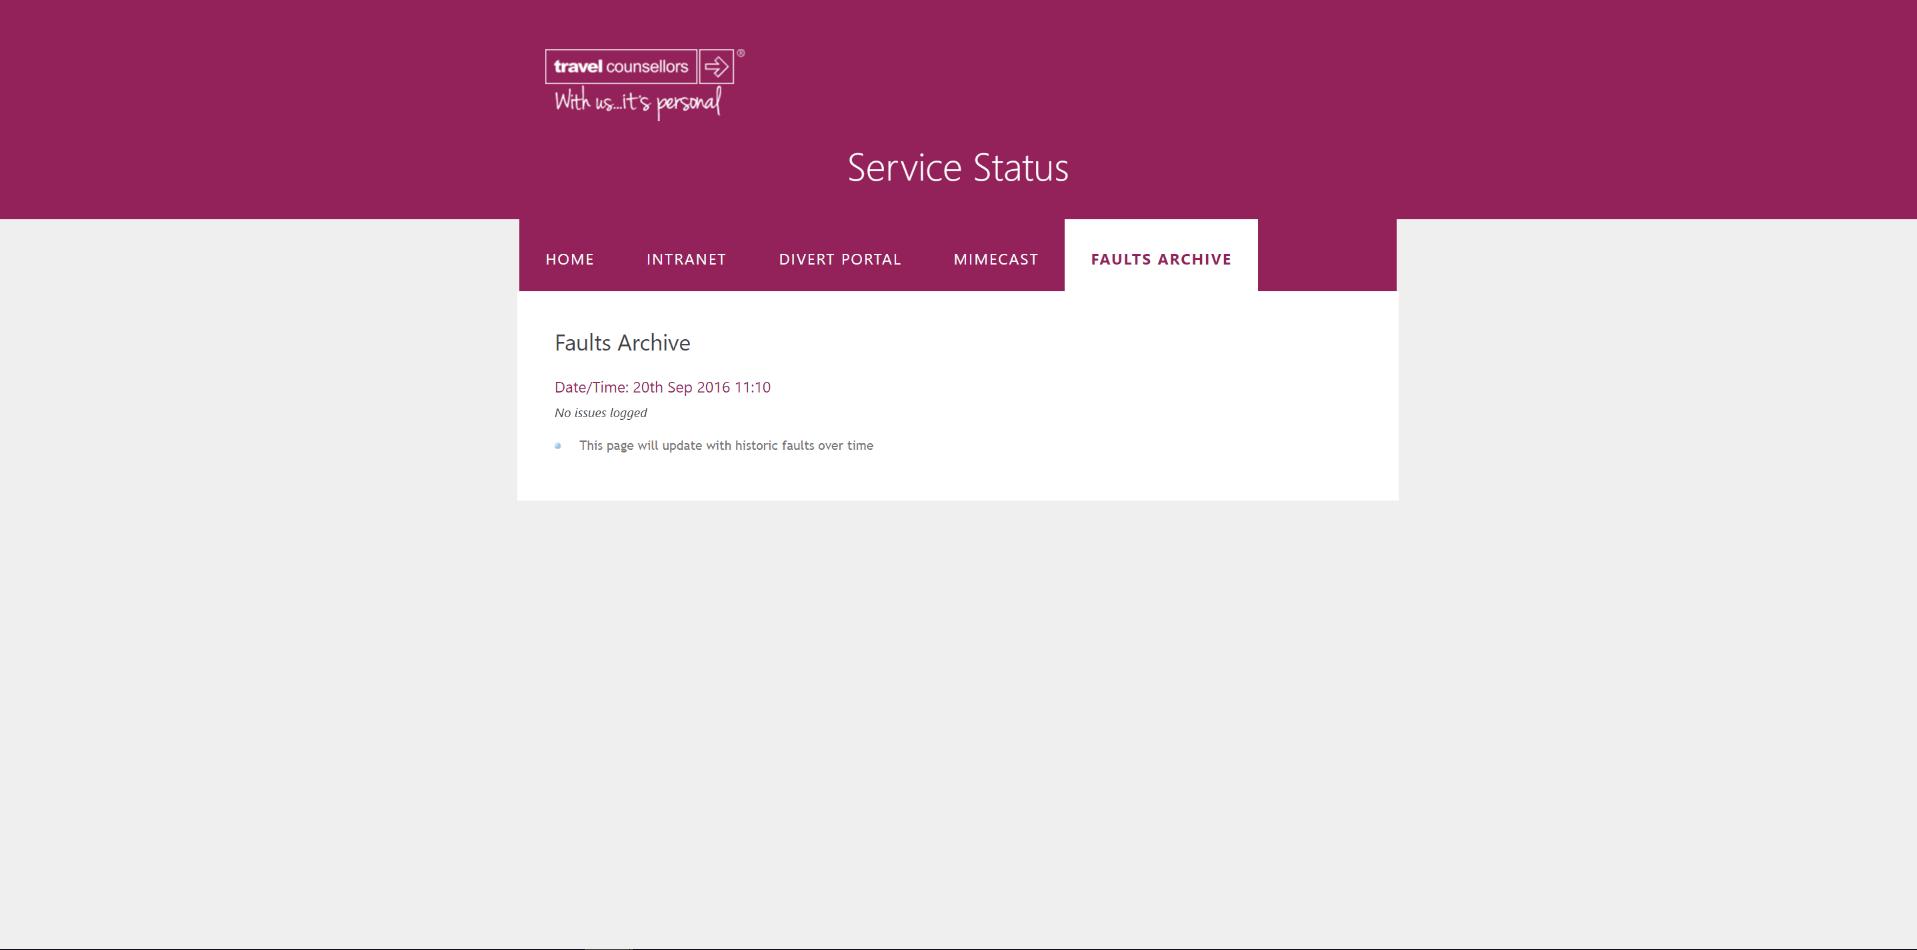 tcservicestatus prospective archive